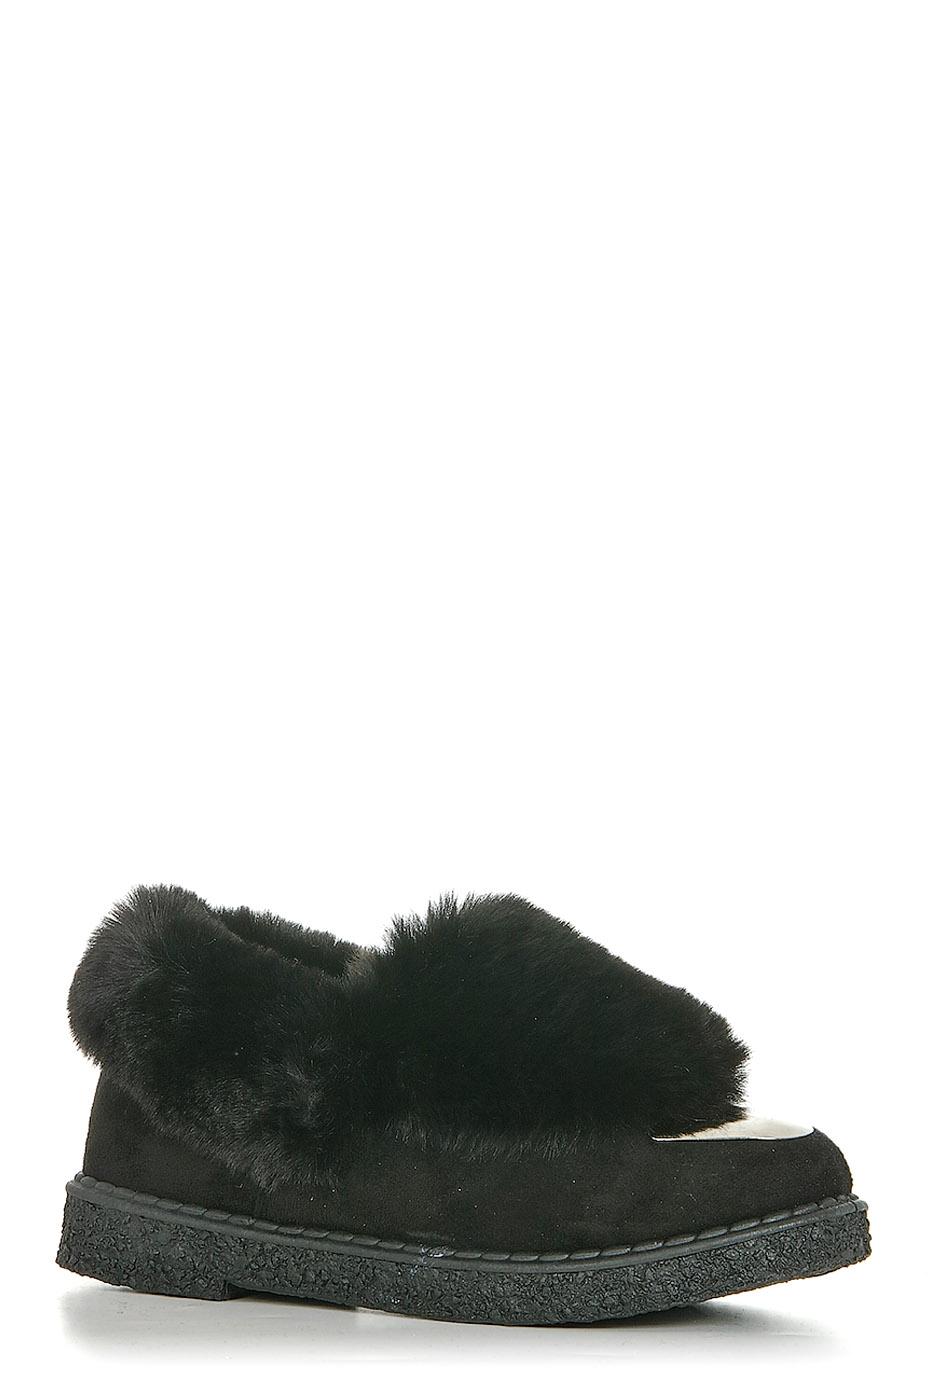 Ботинки TOPLAND2452-PB76266B/BLACK